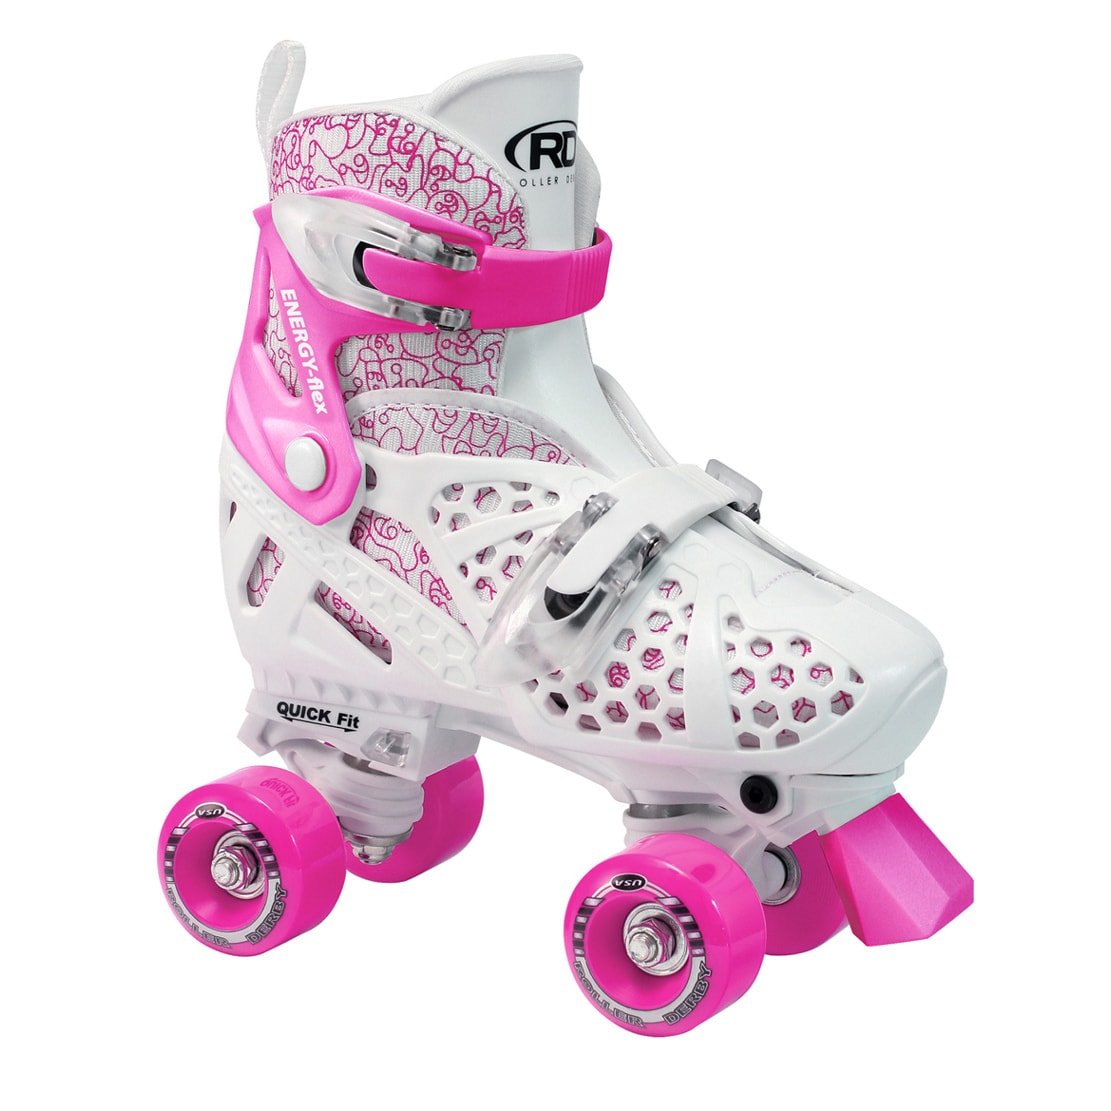 Trac Star Youth Girl's Adjustable Roller Skate (Medium), ...